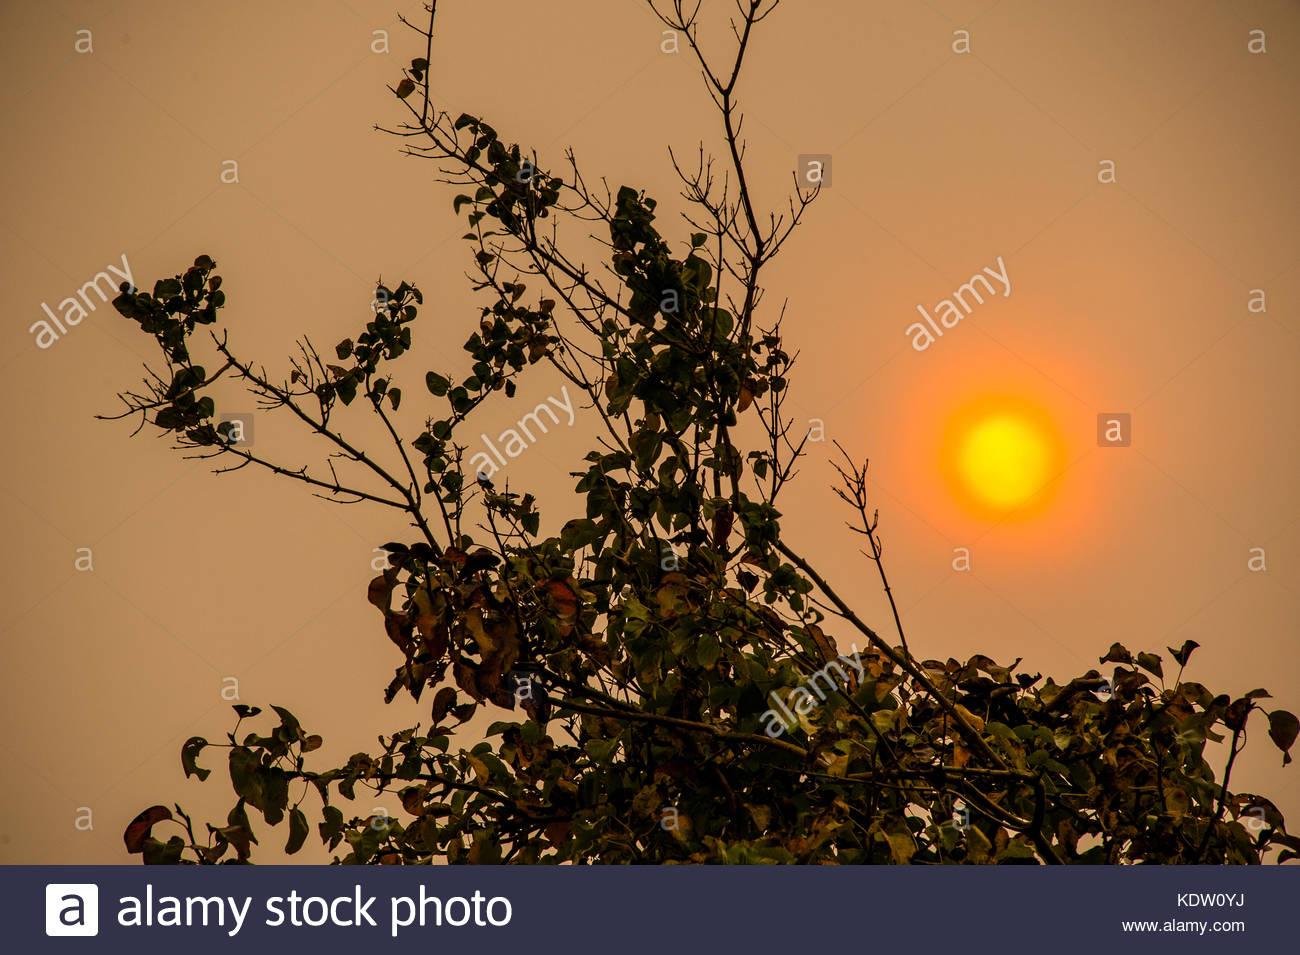 Red sun or Orange sun, Liverpool, England UK. 16th Oct, 2017. UK Weather, Liverpool, England UK. Hurricane Ophelia - Stock Image